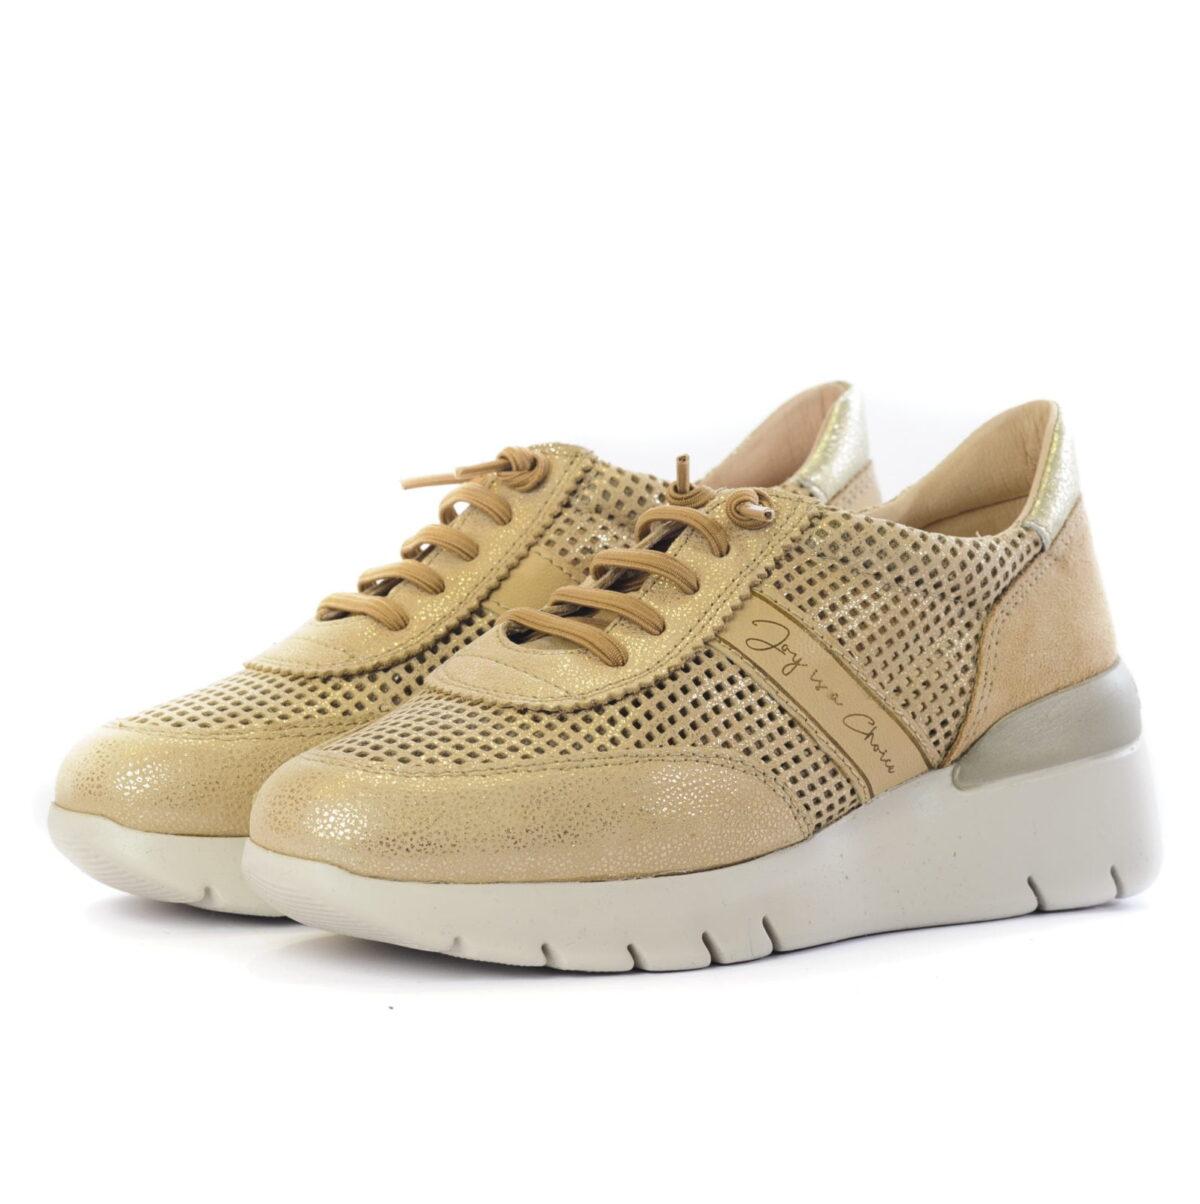 Casual Sneakers Γυναικεία Casual Sneaker Μπέζ Χρυσό